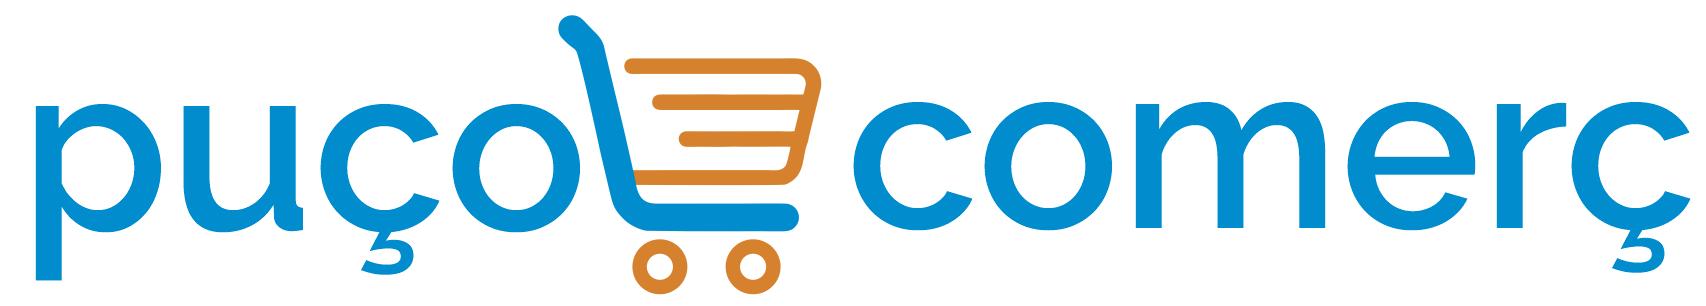 Marketplace Puçol Comerç compras online